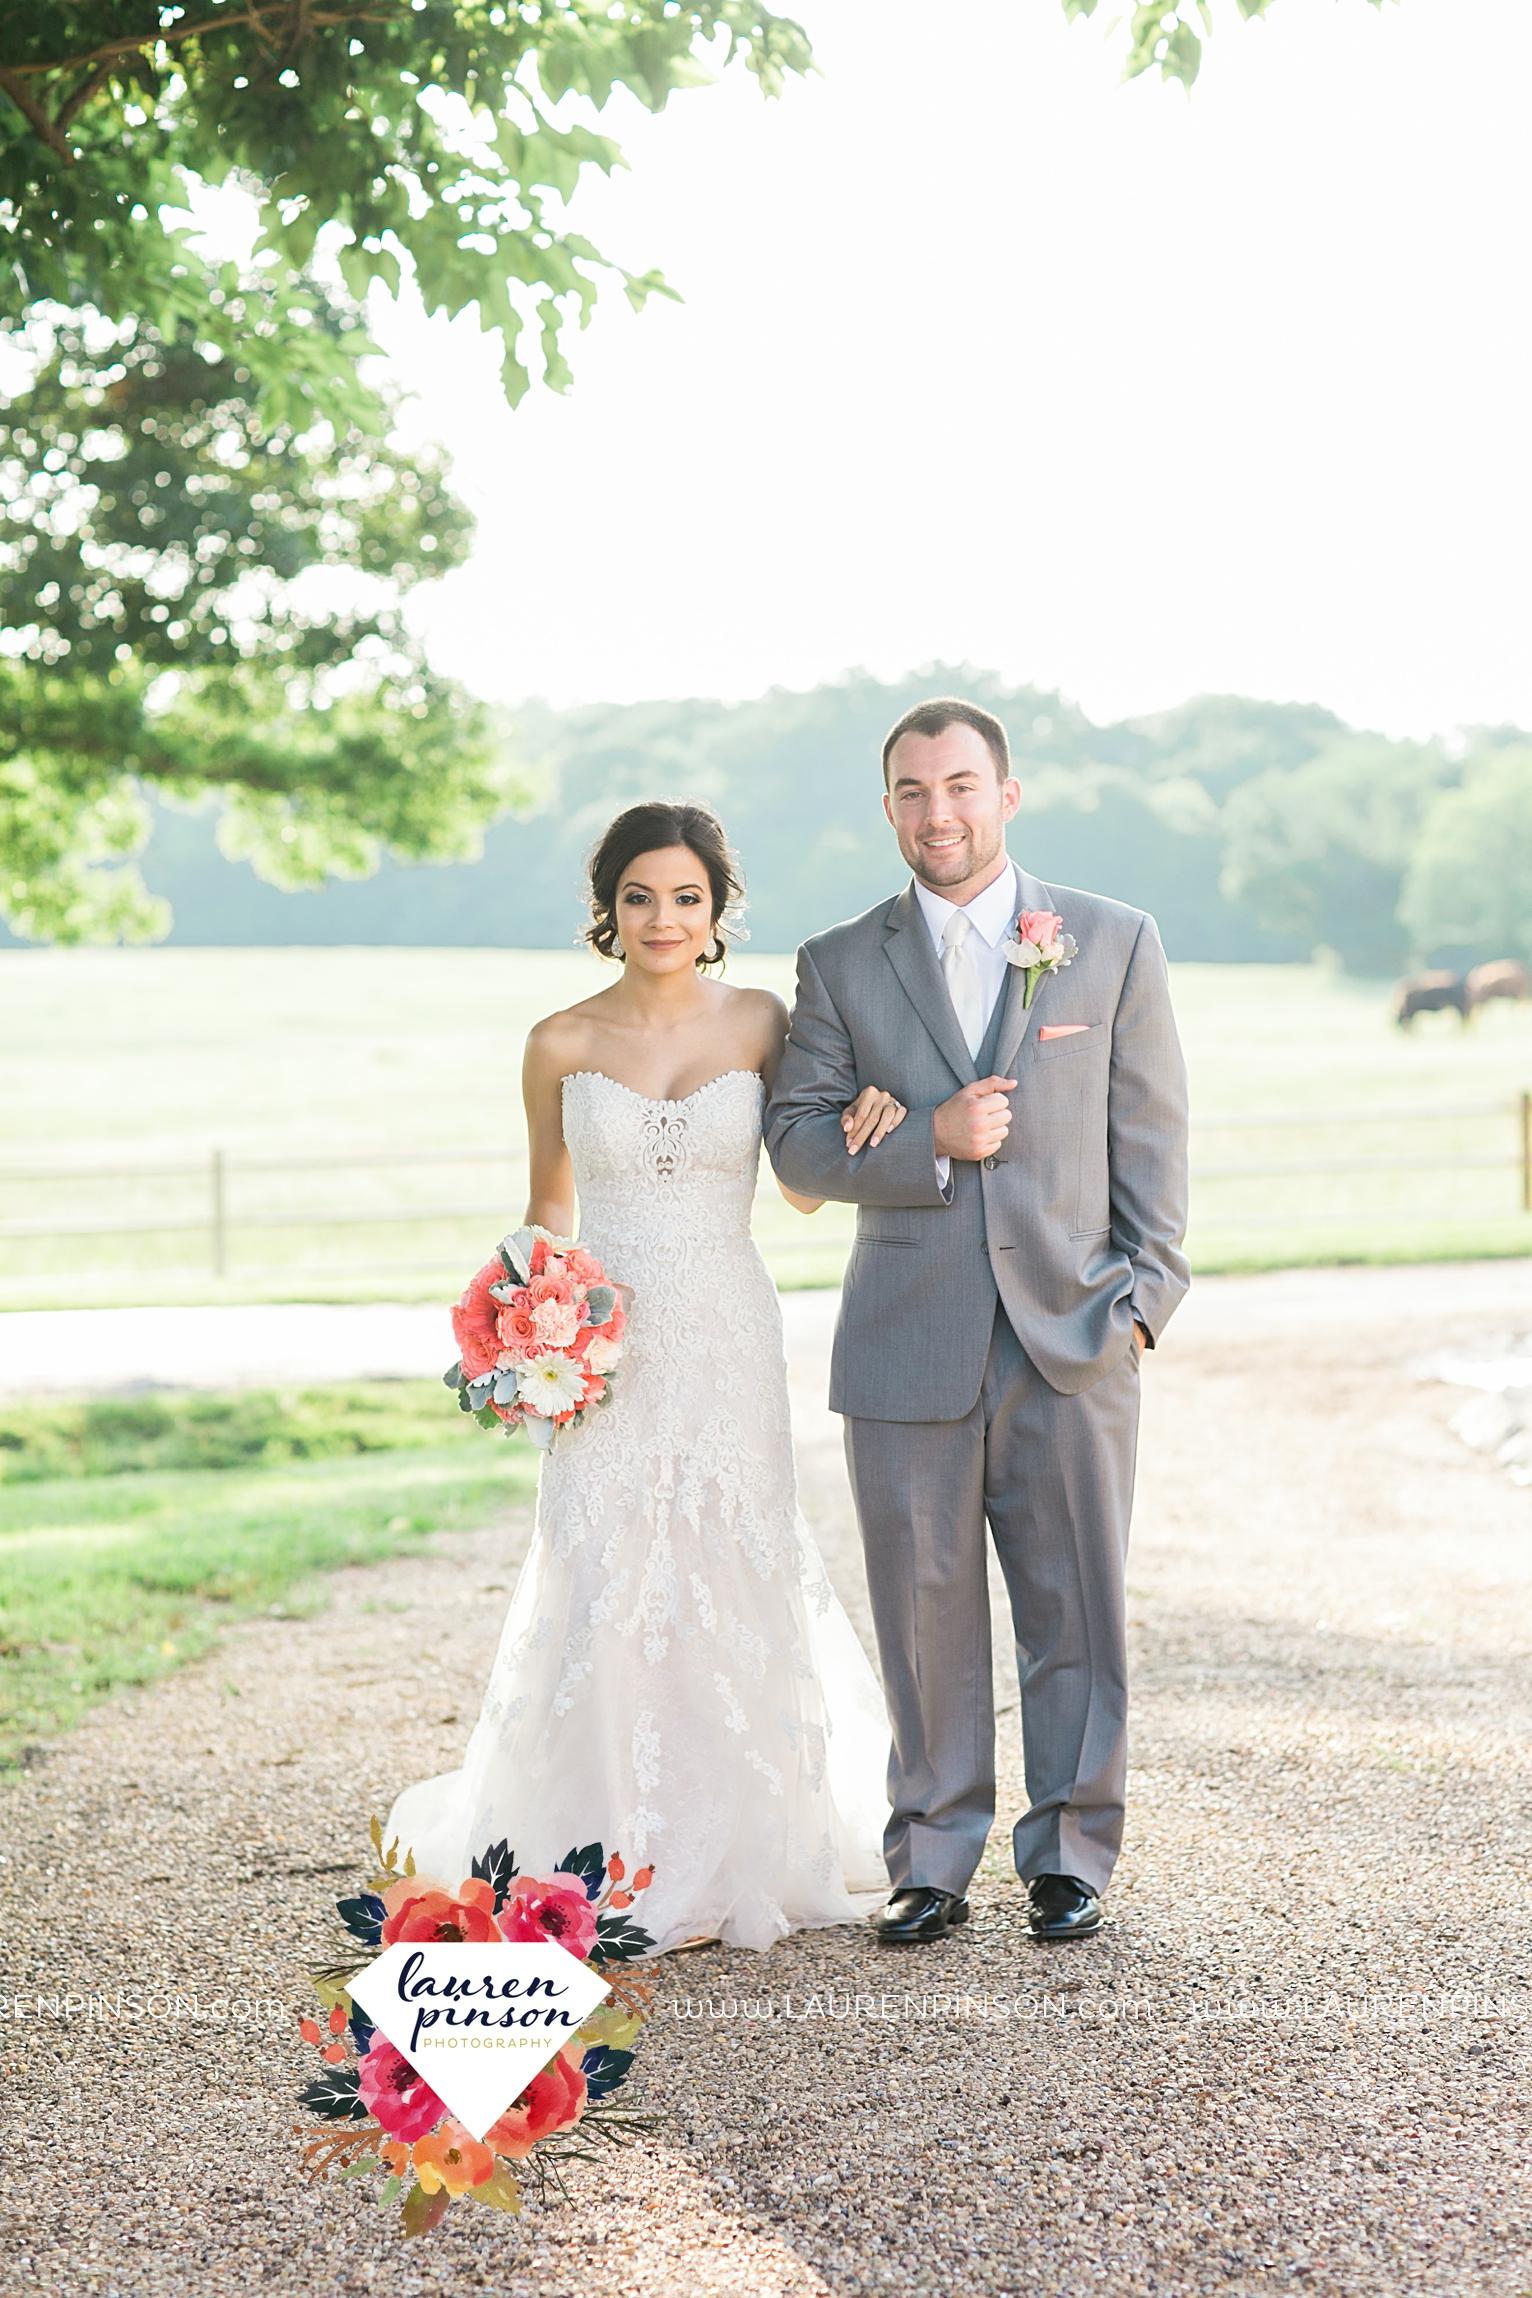 wichita-falls-wedding-nocona-comanche-rose-ranch-rustic-pink-gray-photography-00168.jpg